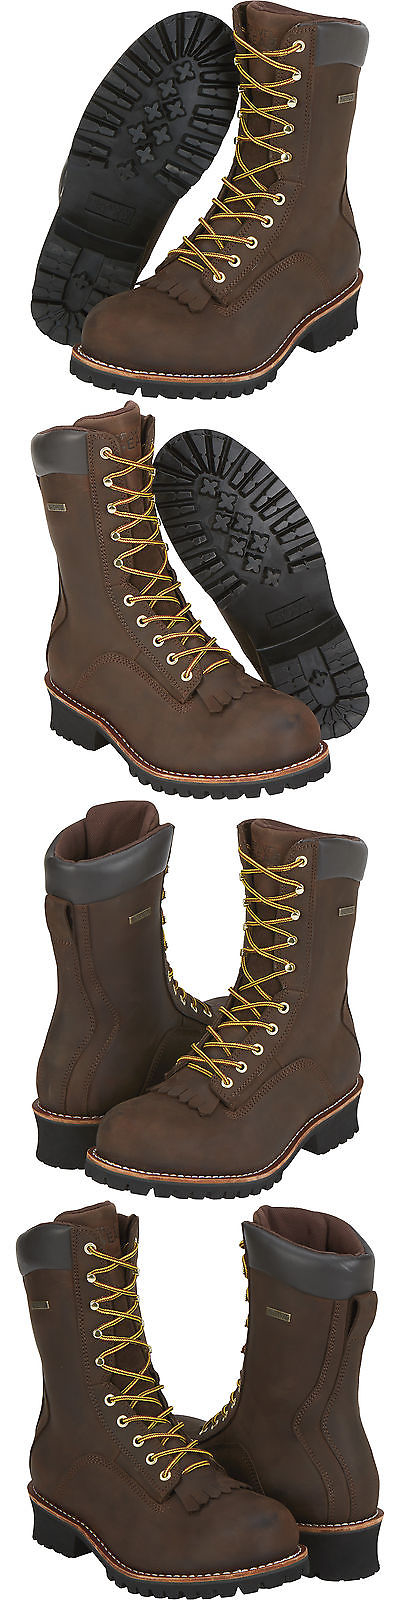 1c132aac4be Boots 11498: Gravel Gear 10In Waterproof Steel Toe Logger Work Boots ...